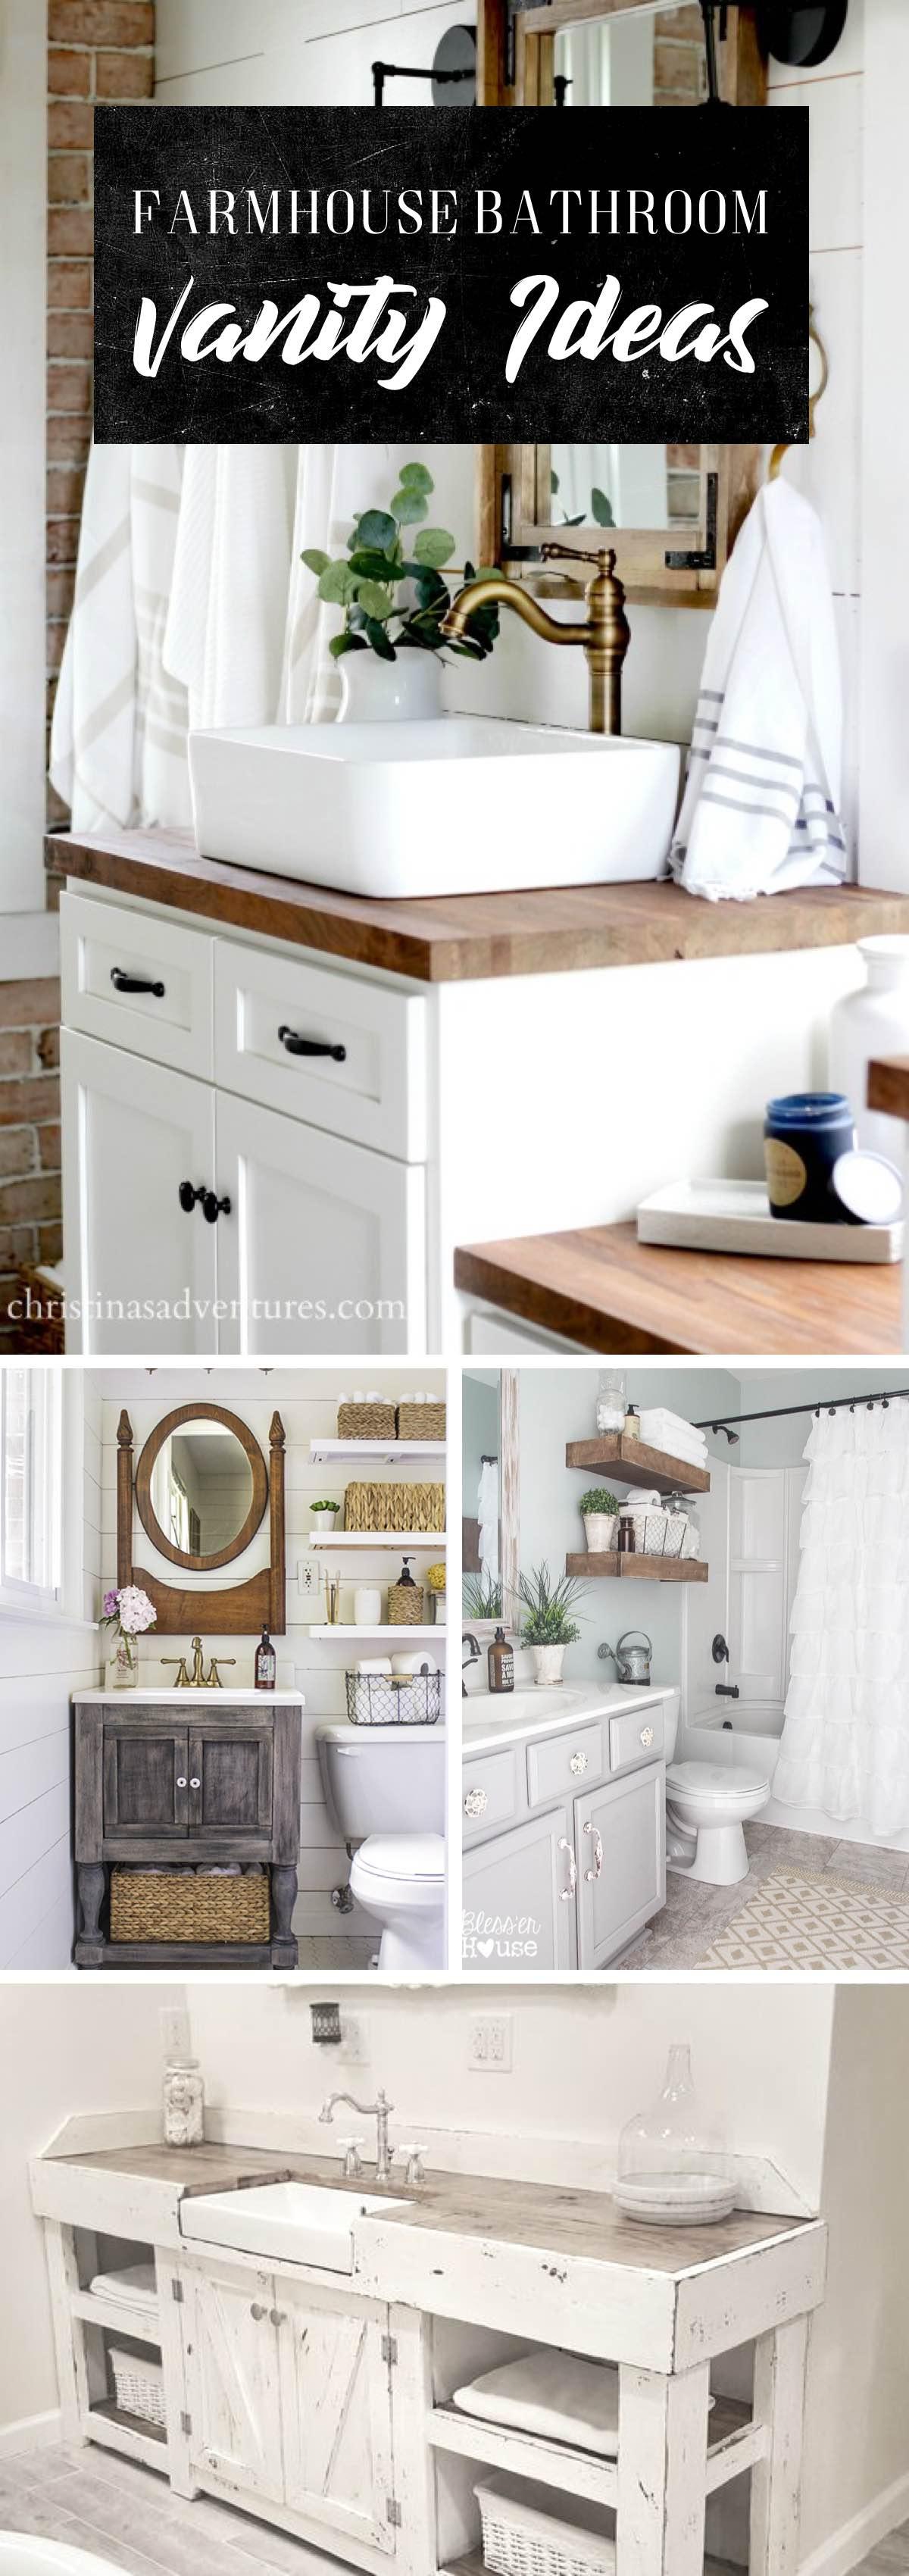 19 stylish farmhouse bathroom vanity